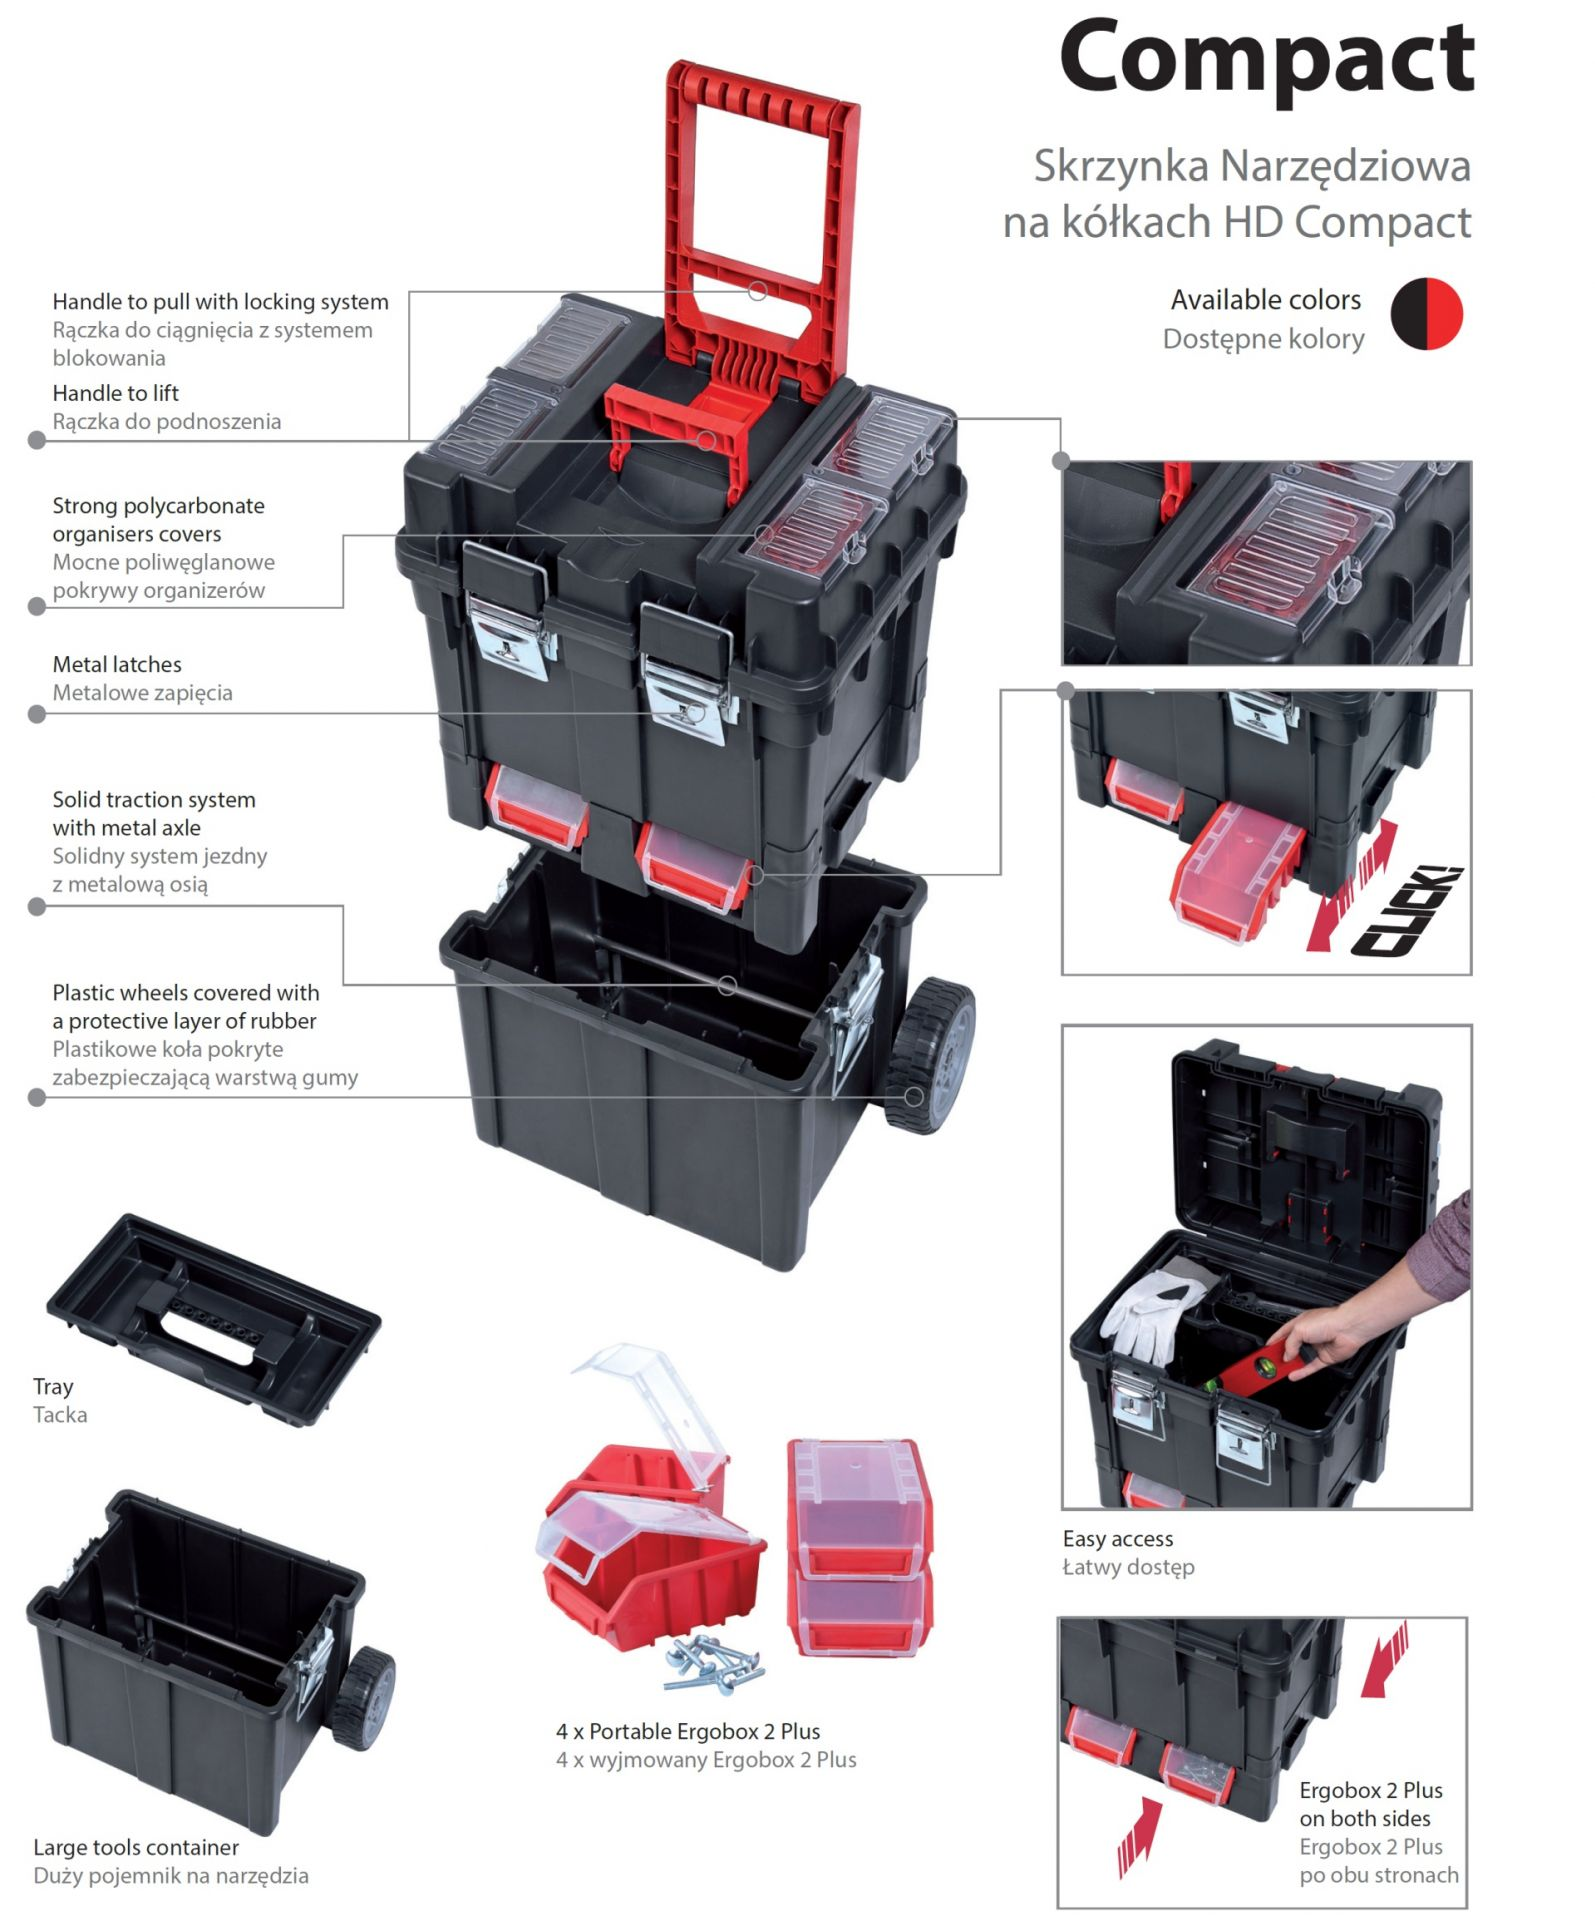 Budowa akrzynki Wheelbox HD Compact na kółkach charakterystyka